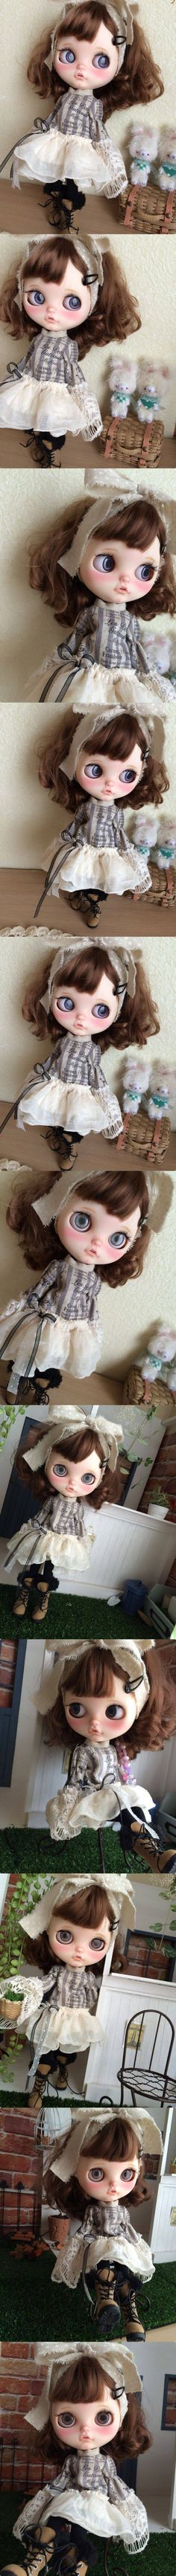 *Raindrop*~custom Blythe~カスタムブライス - ヤフオク!